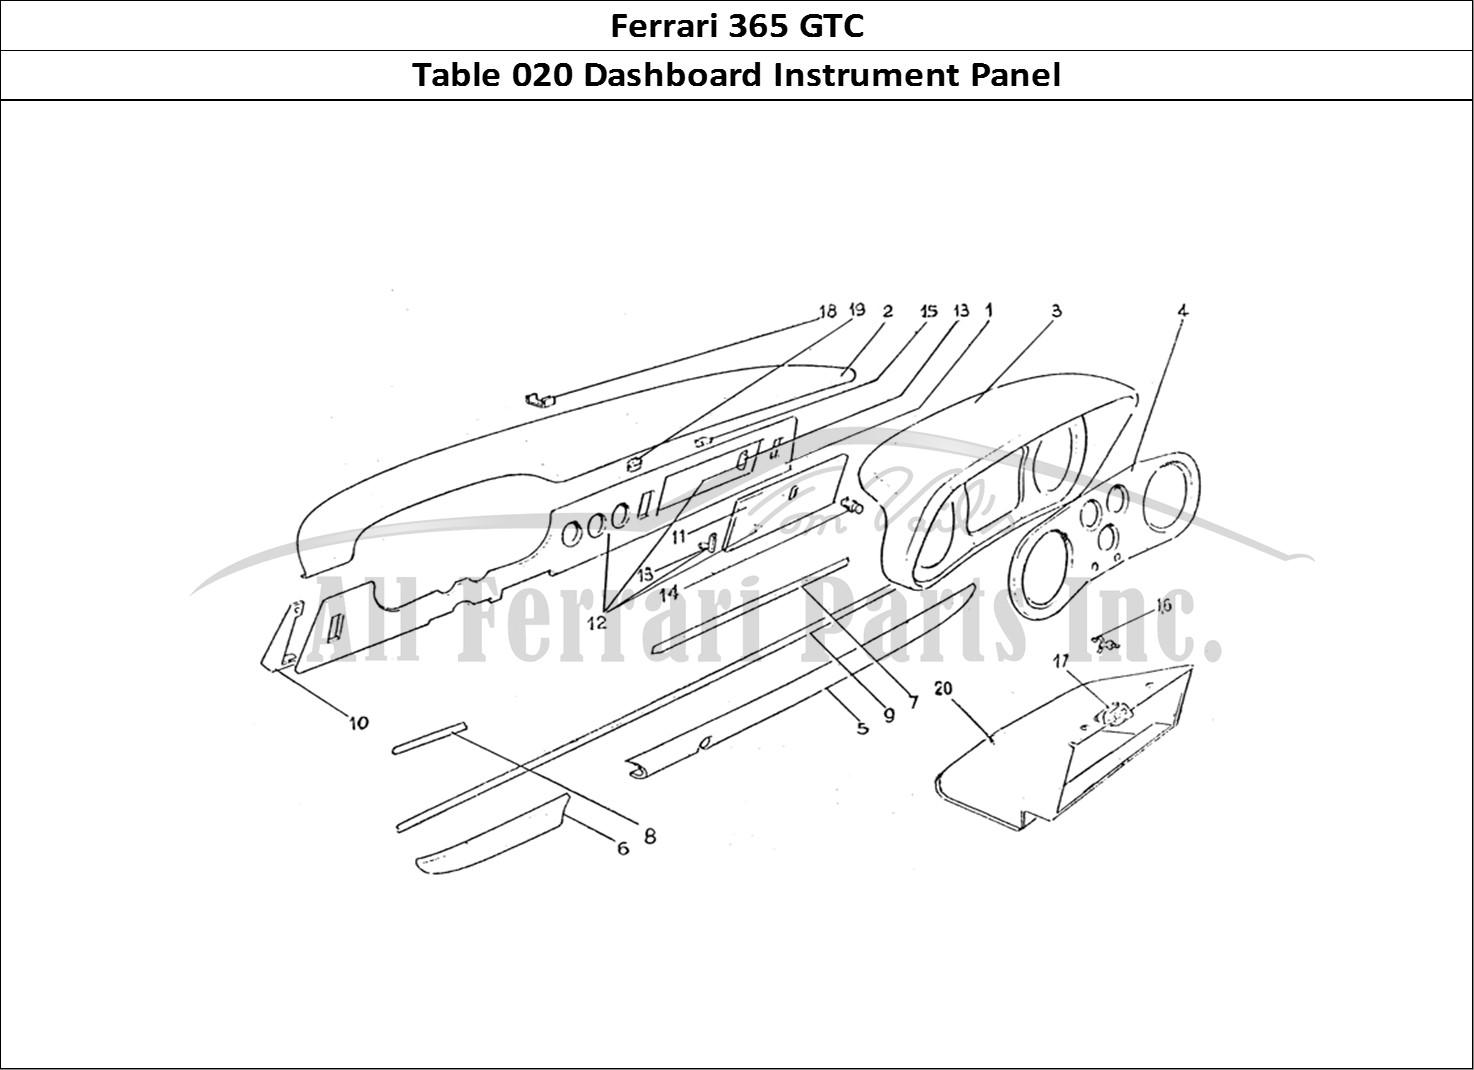 Buy Original Ferrari 365 Gtc 020 Dashboard Instrument